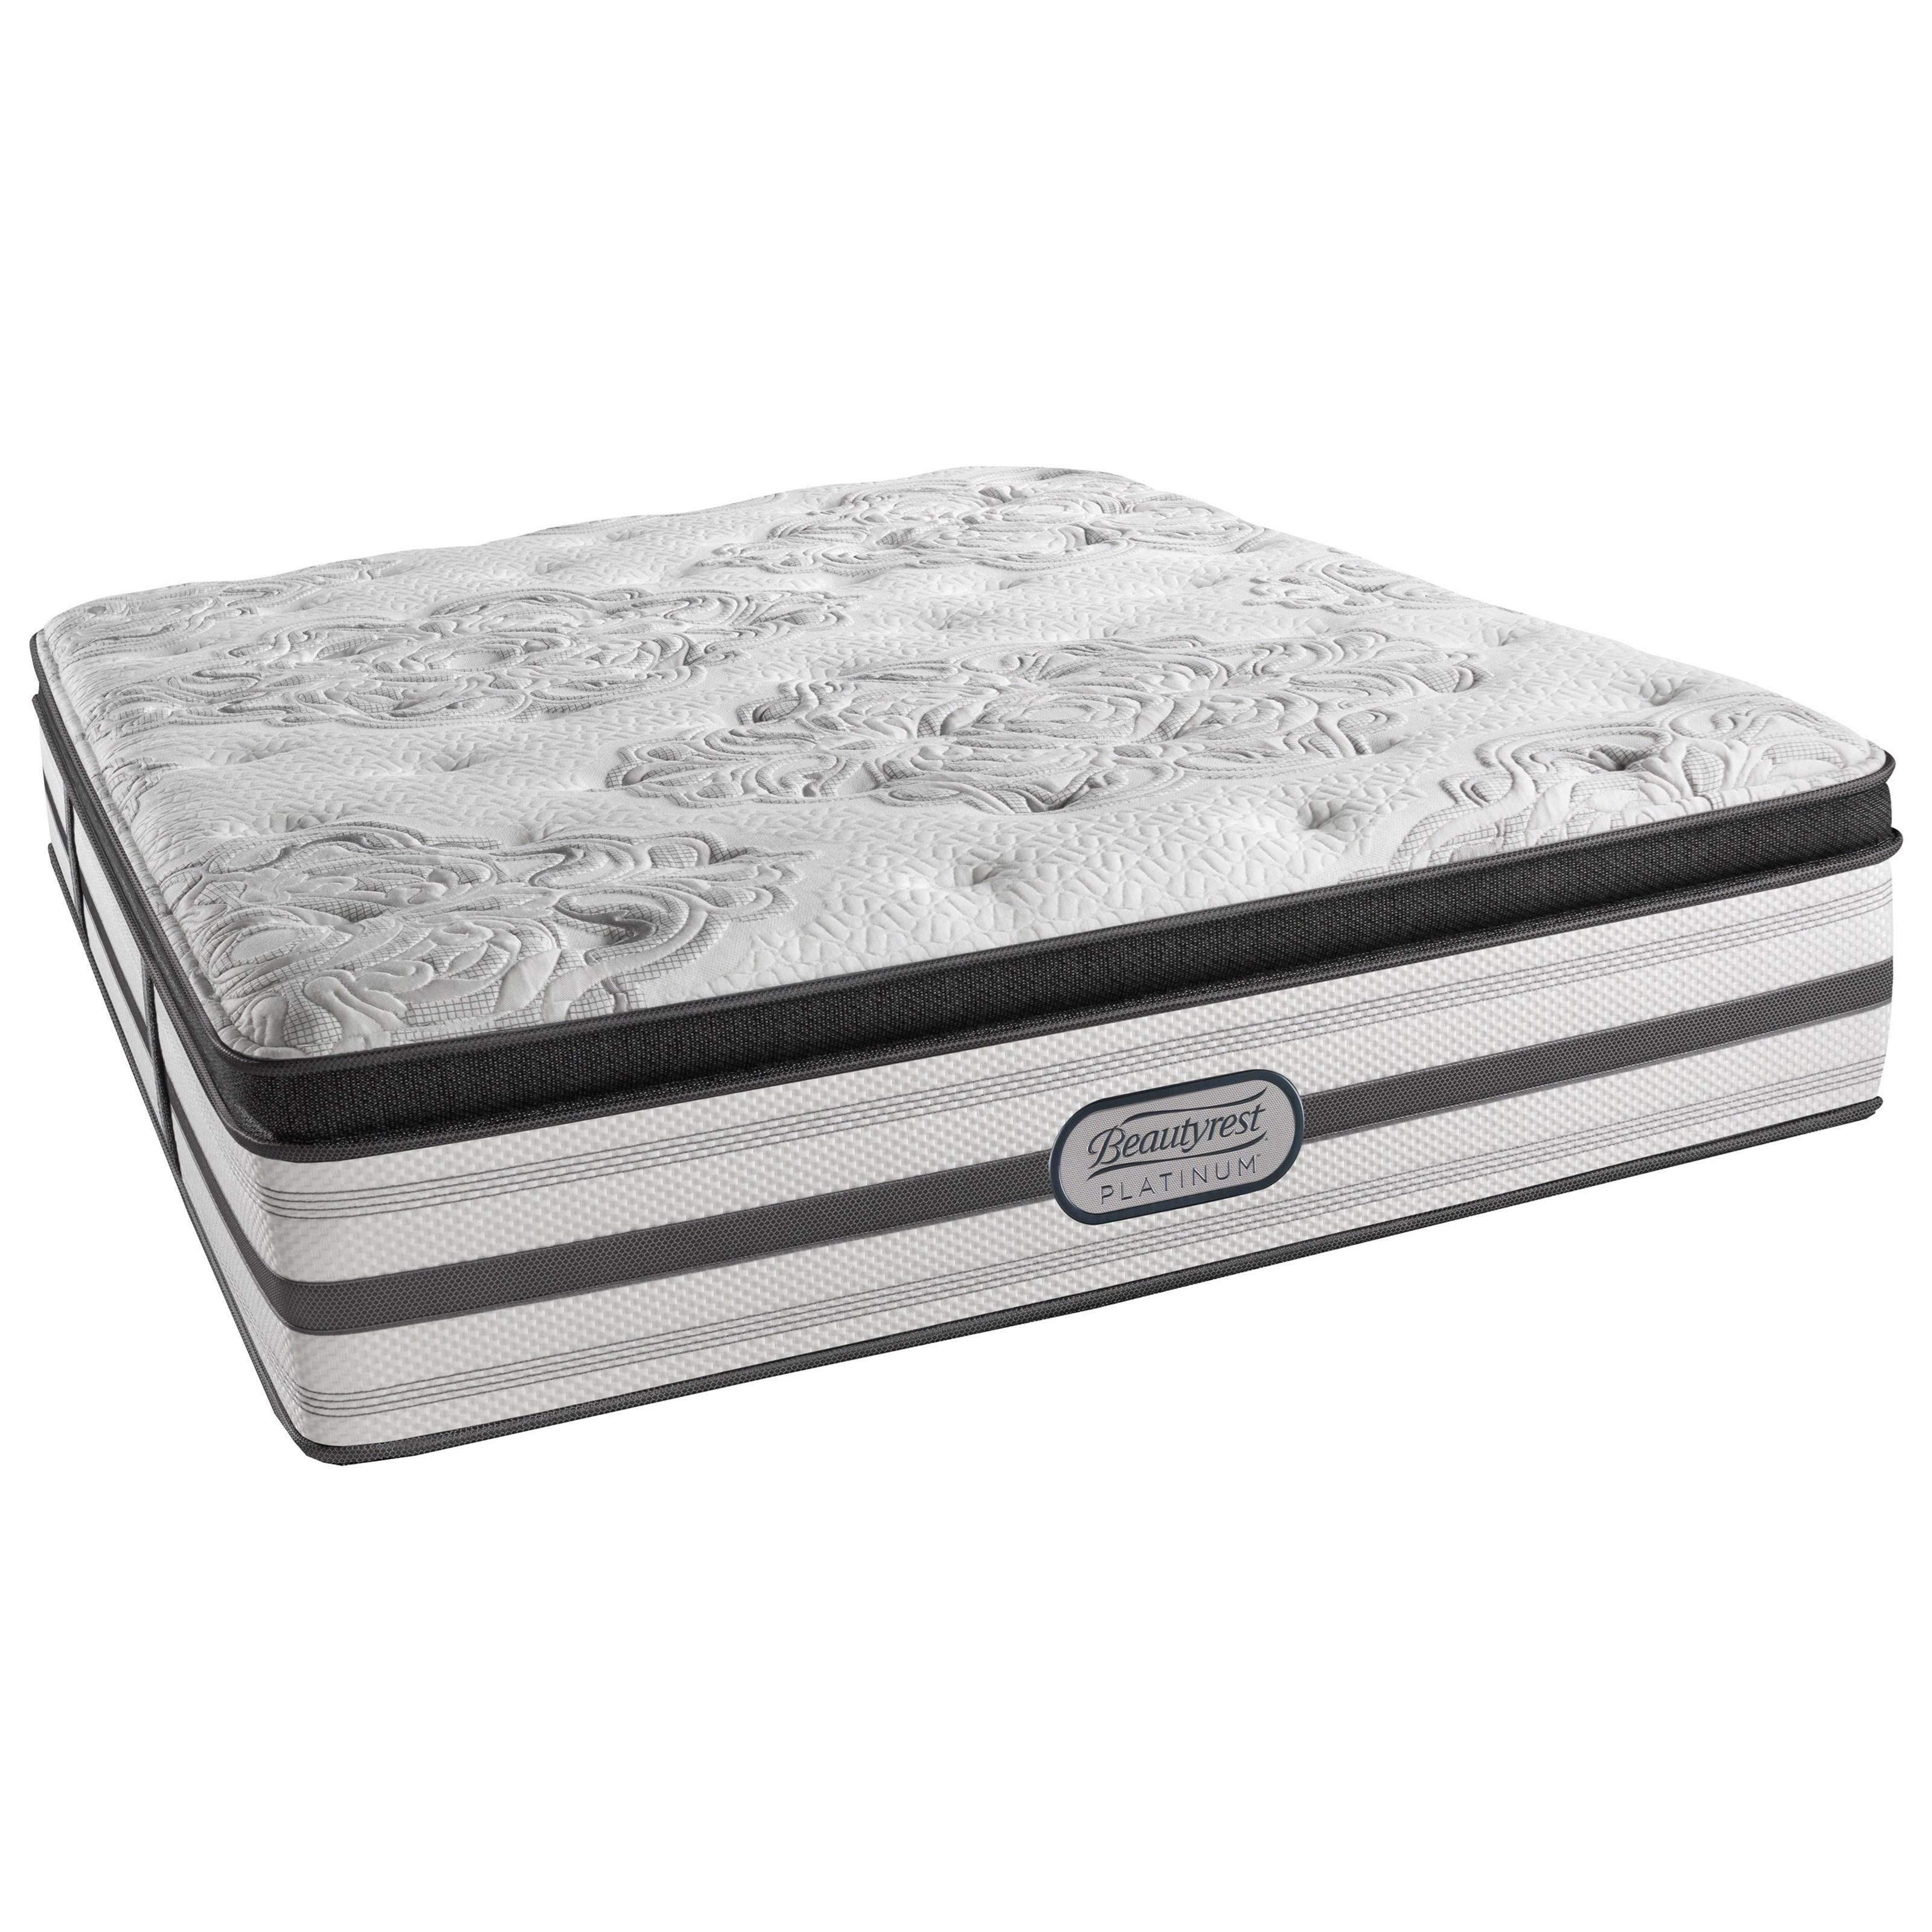 Beautyrest Platinum Gabriella King Luxury Firm Pillow Top Adjustable Set - Item Number: LV3LFPT-K+2xSM2-TXLK